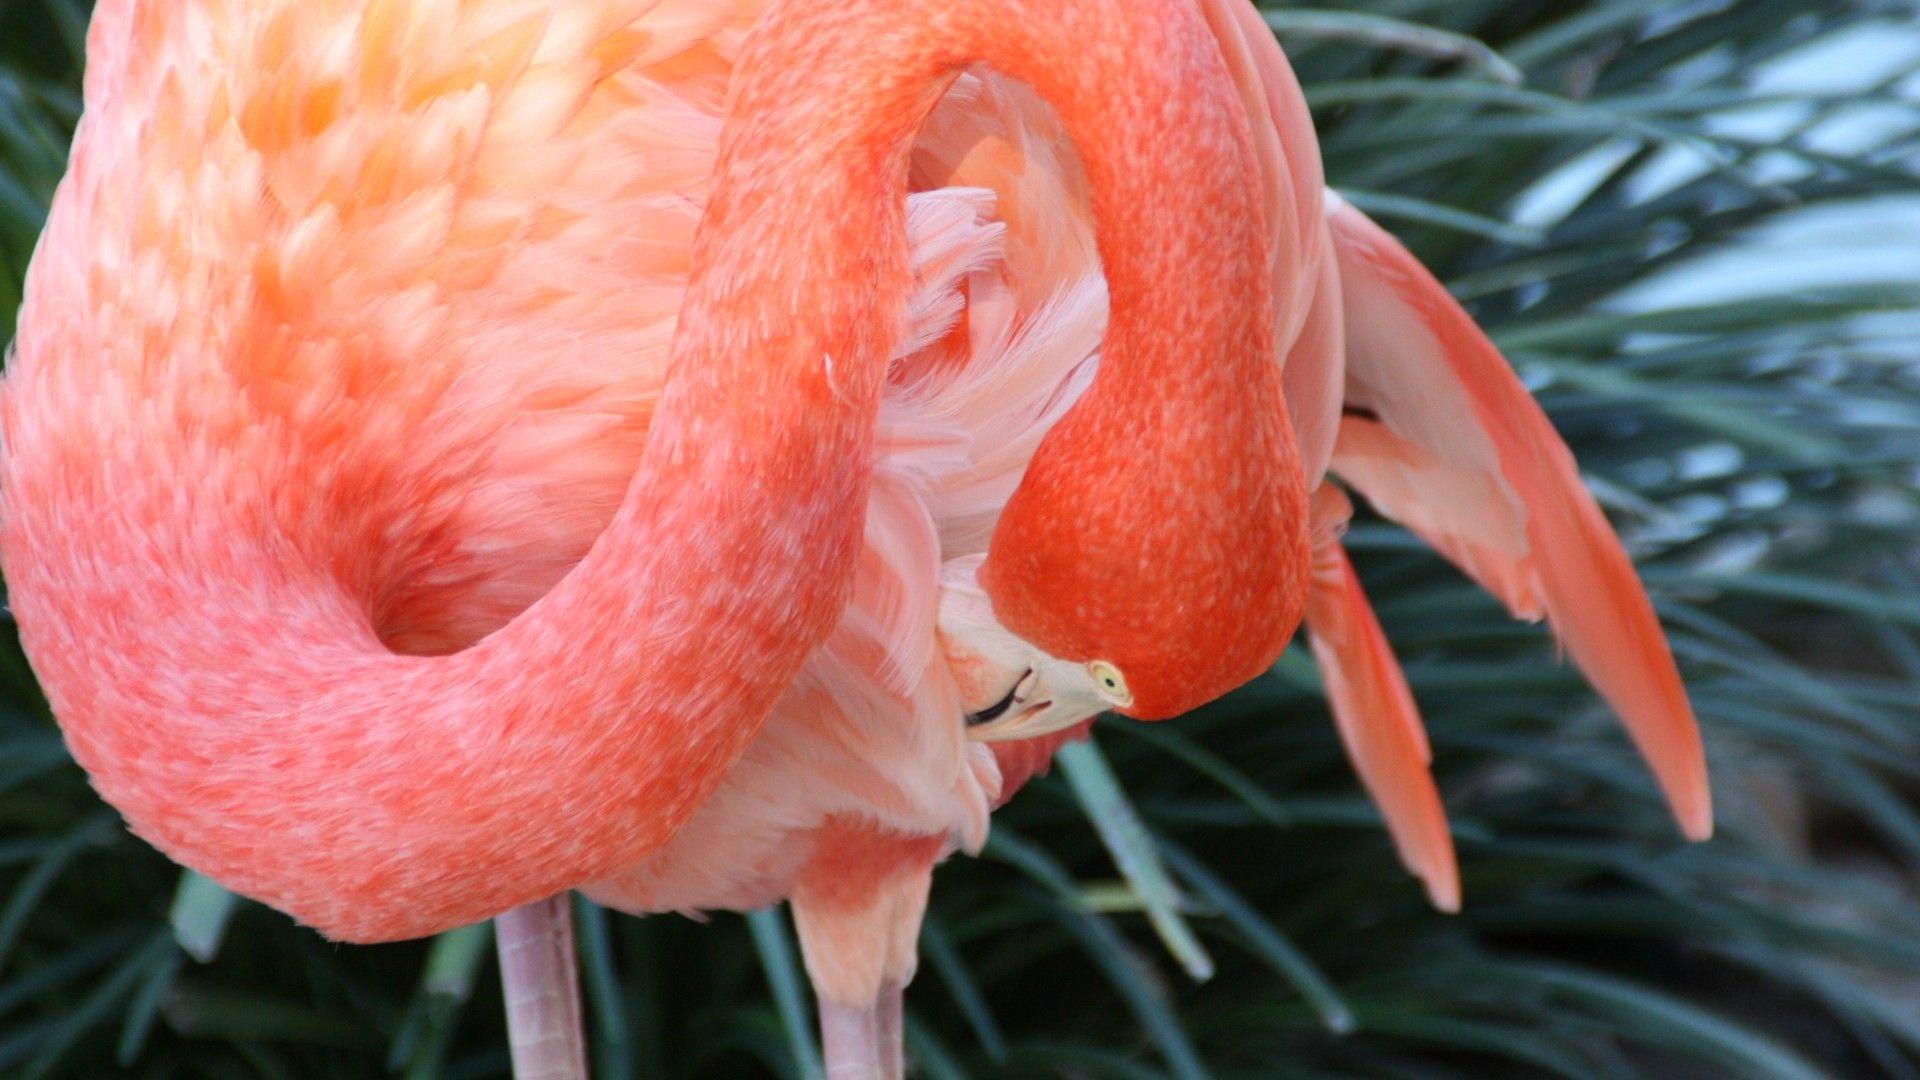 Flamingo, Sun Diego, zoo, bird, red, plumage, tourism, pond